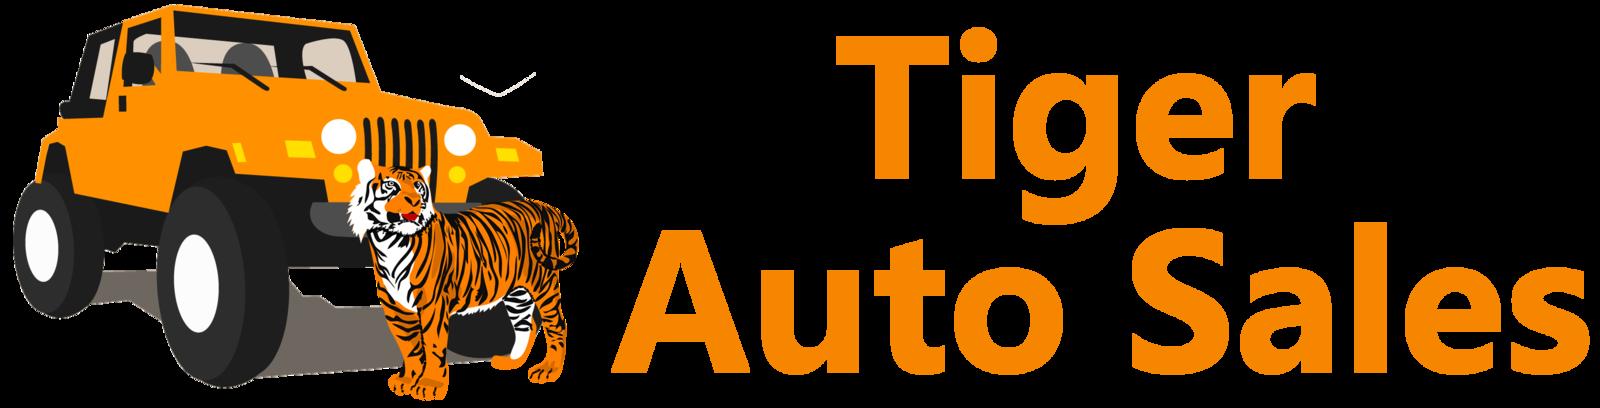 Tiger Auto Sales >> Tiger Auto Sales London On Read Consumer Reviews Browse